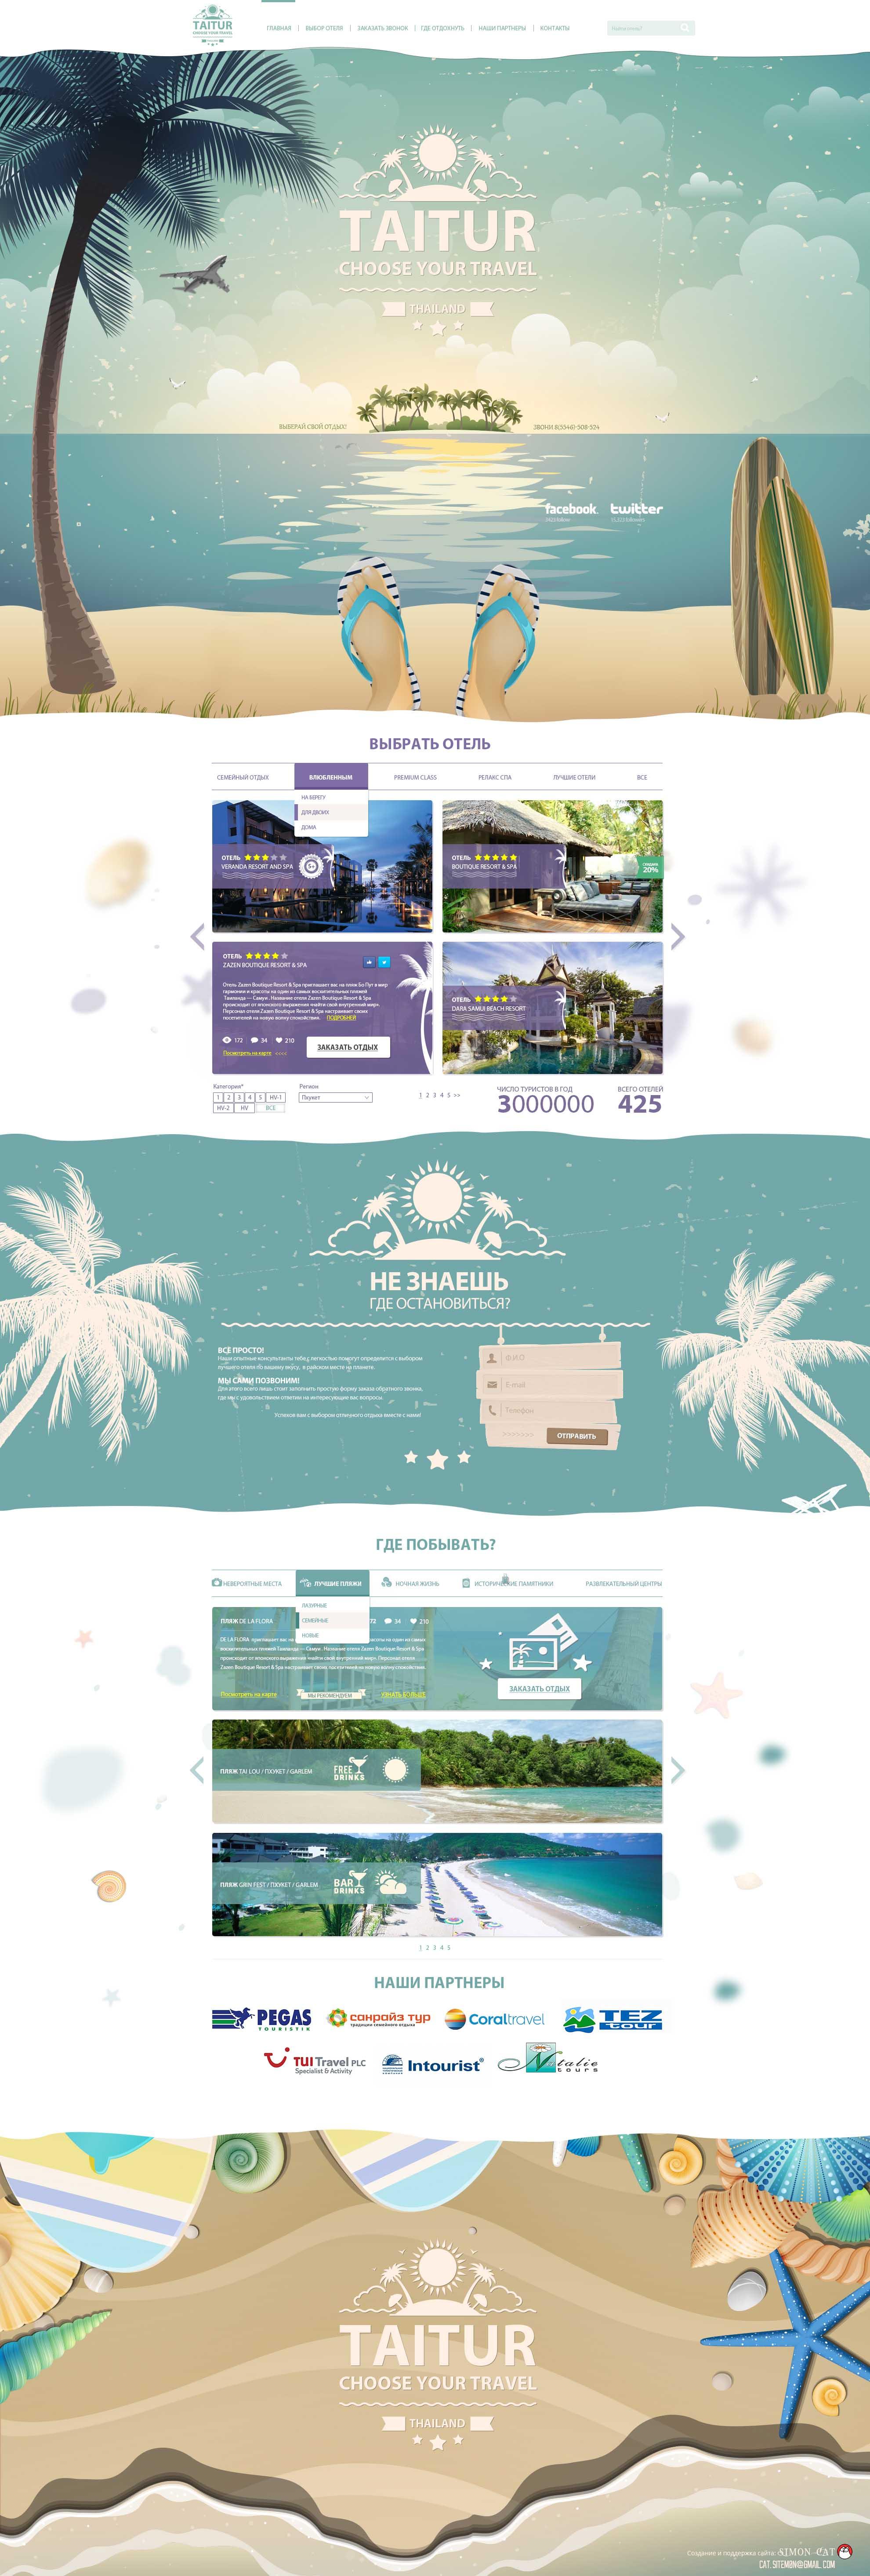 Дизайн сайта TaiTur